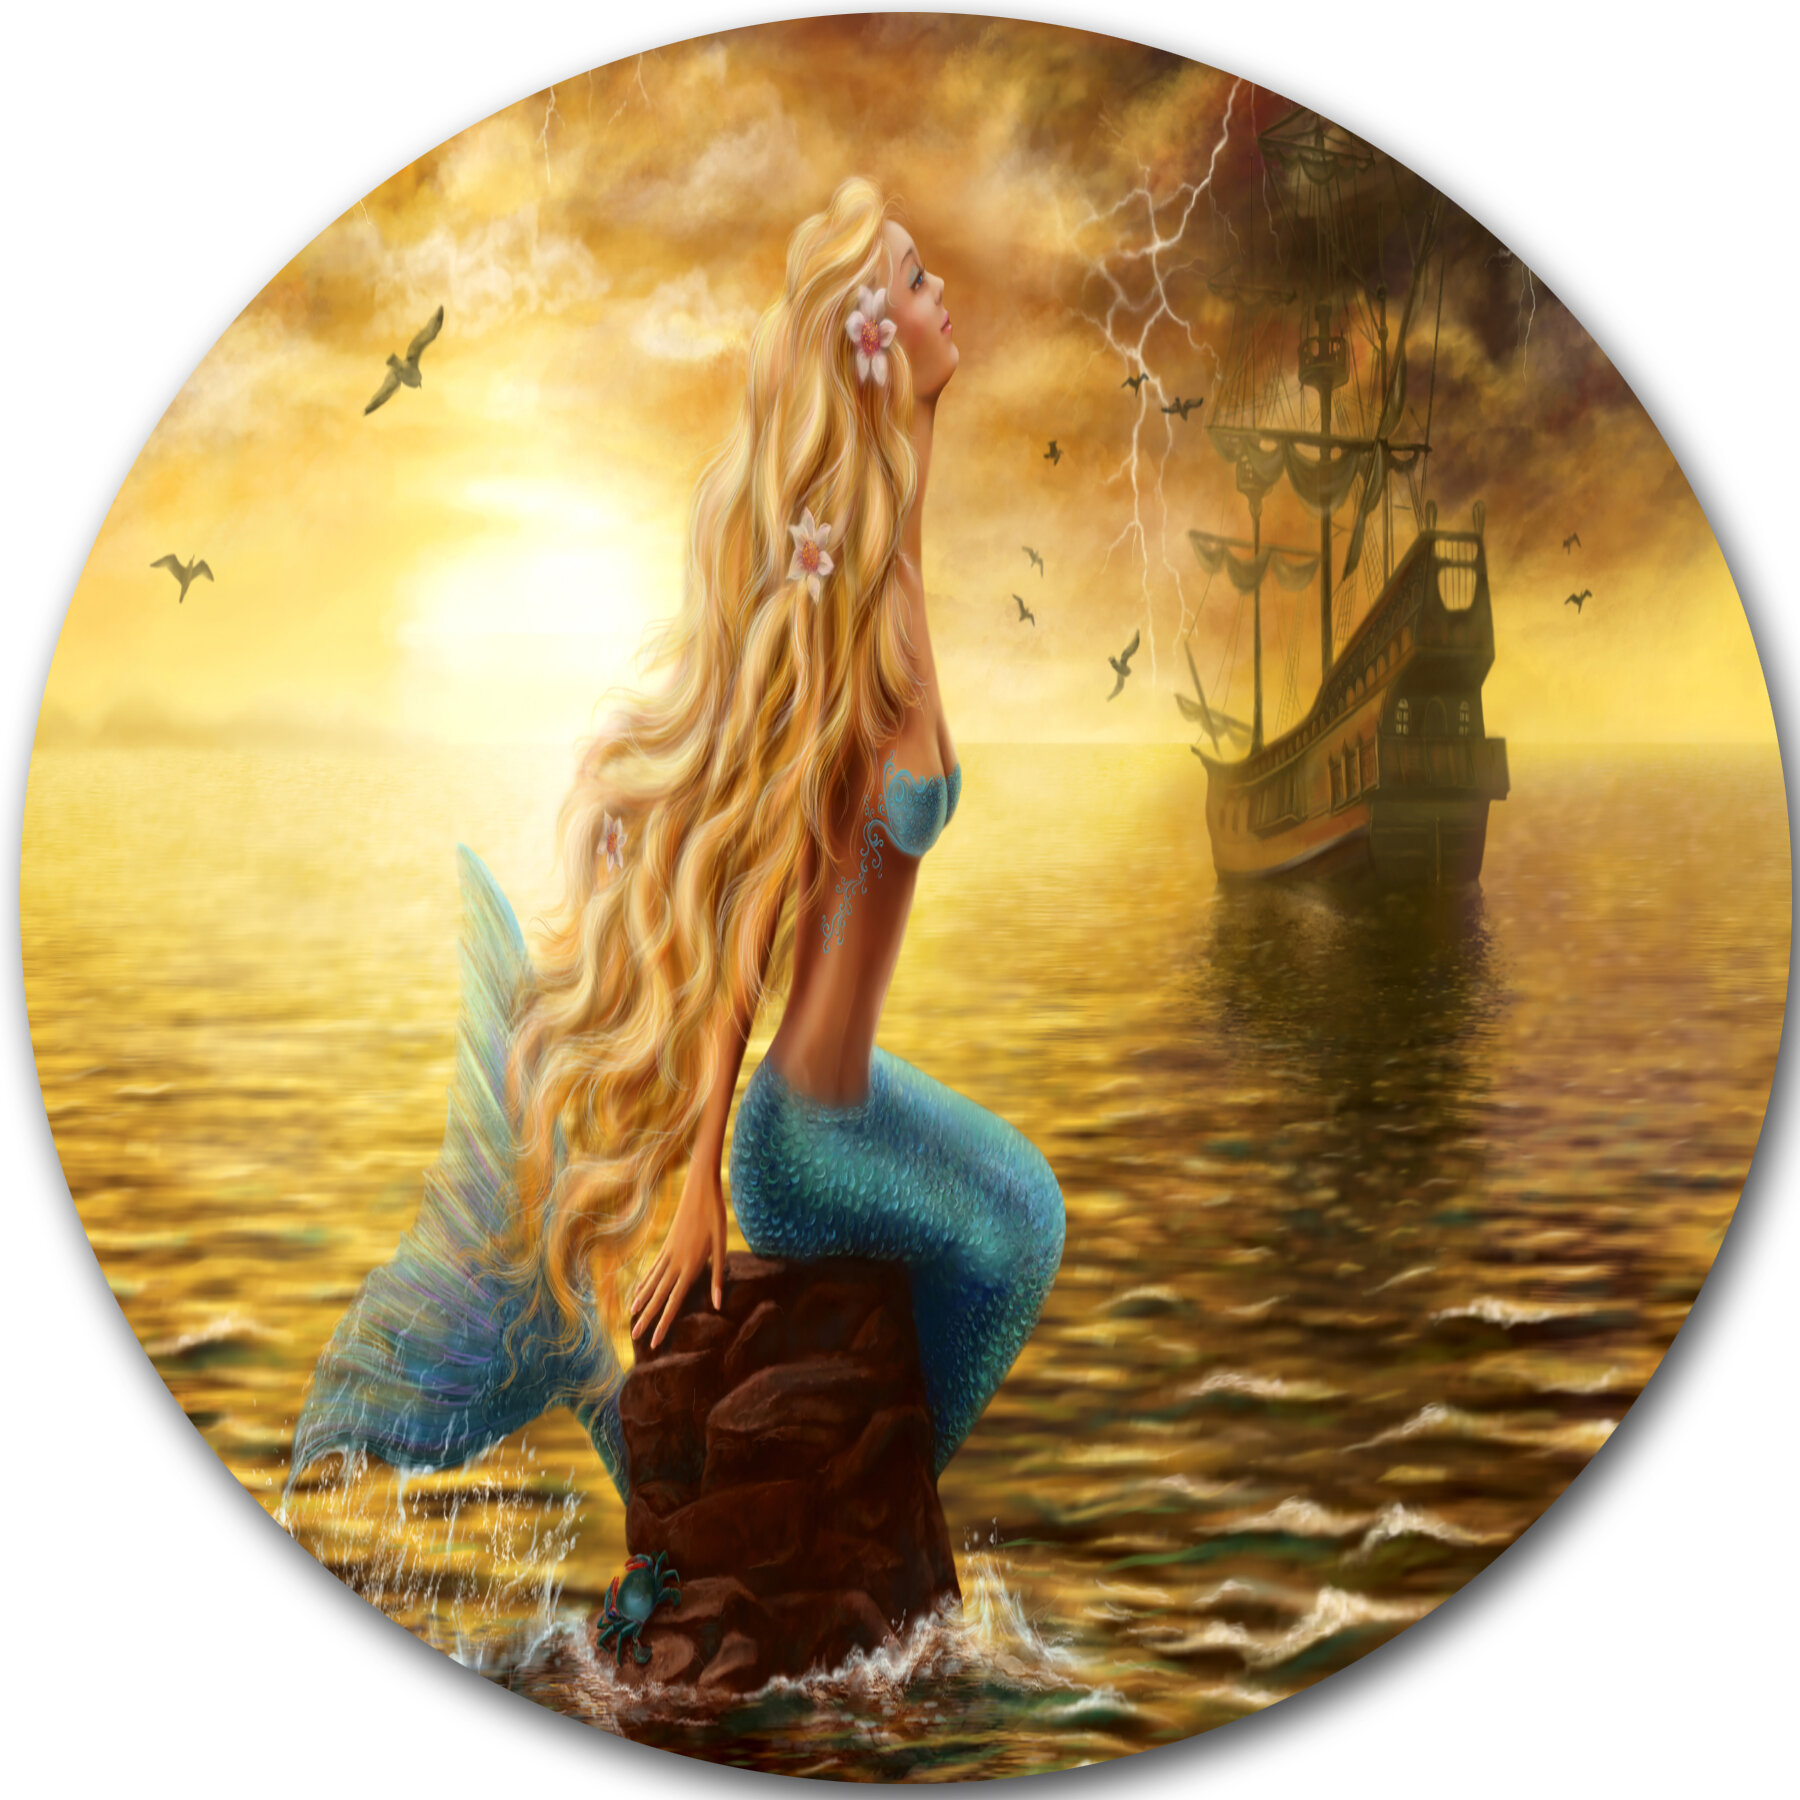 DesignArt \'Sea Mermaid with Ghost Ship\' Graphic Art Print on Metal ...